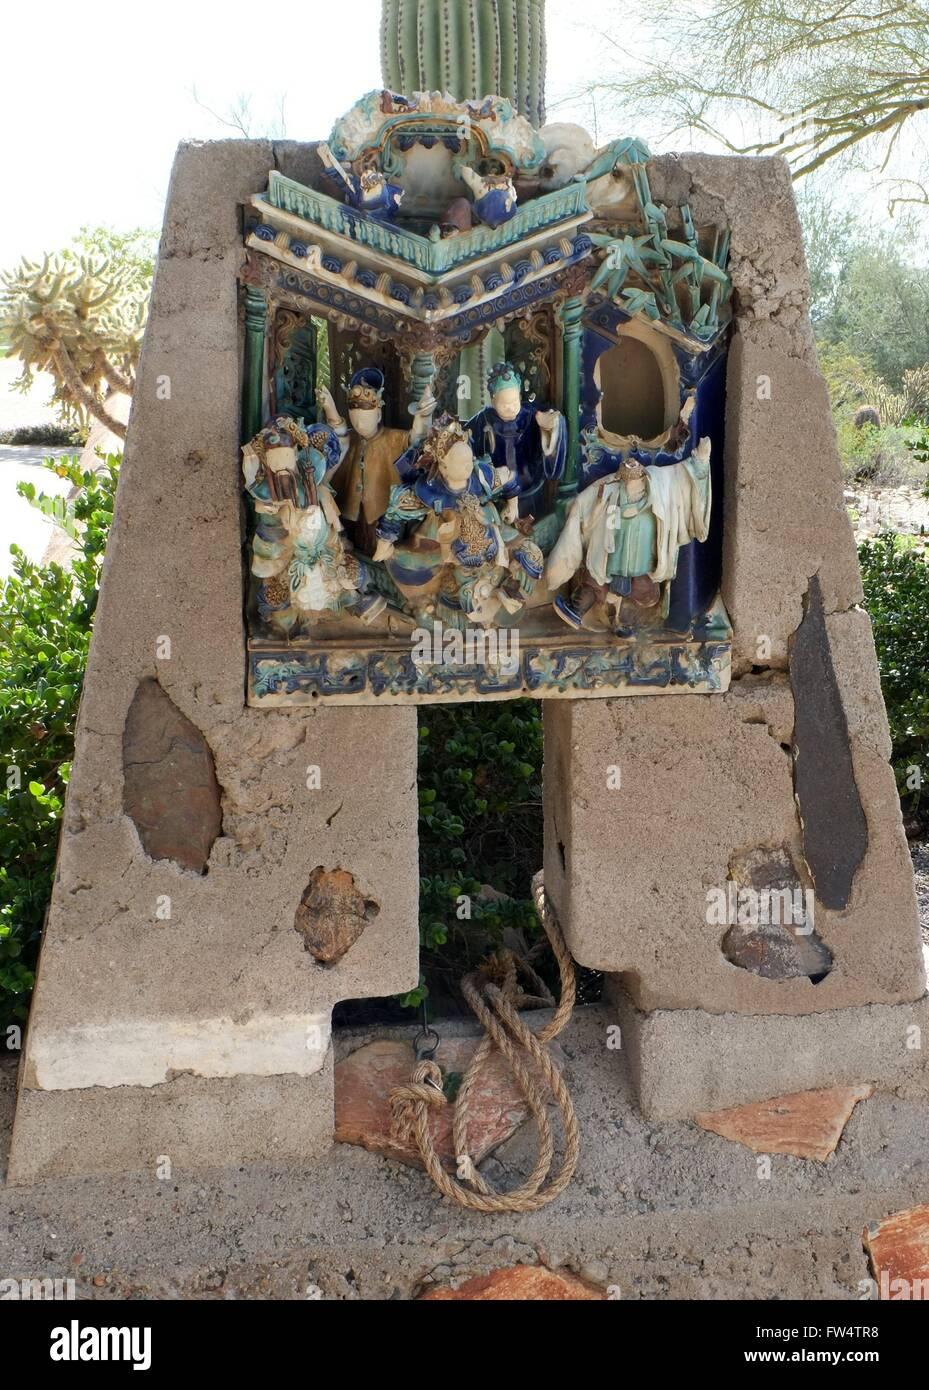 Famous broken Chinese Statuary, Taliesin West, AZ - Stock Image